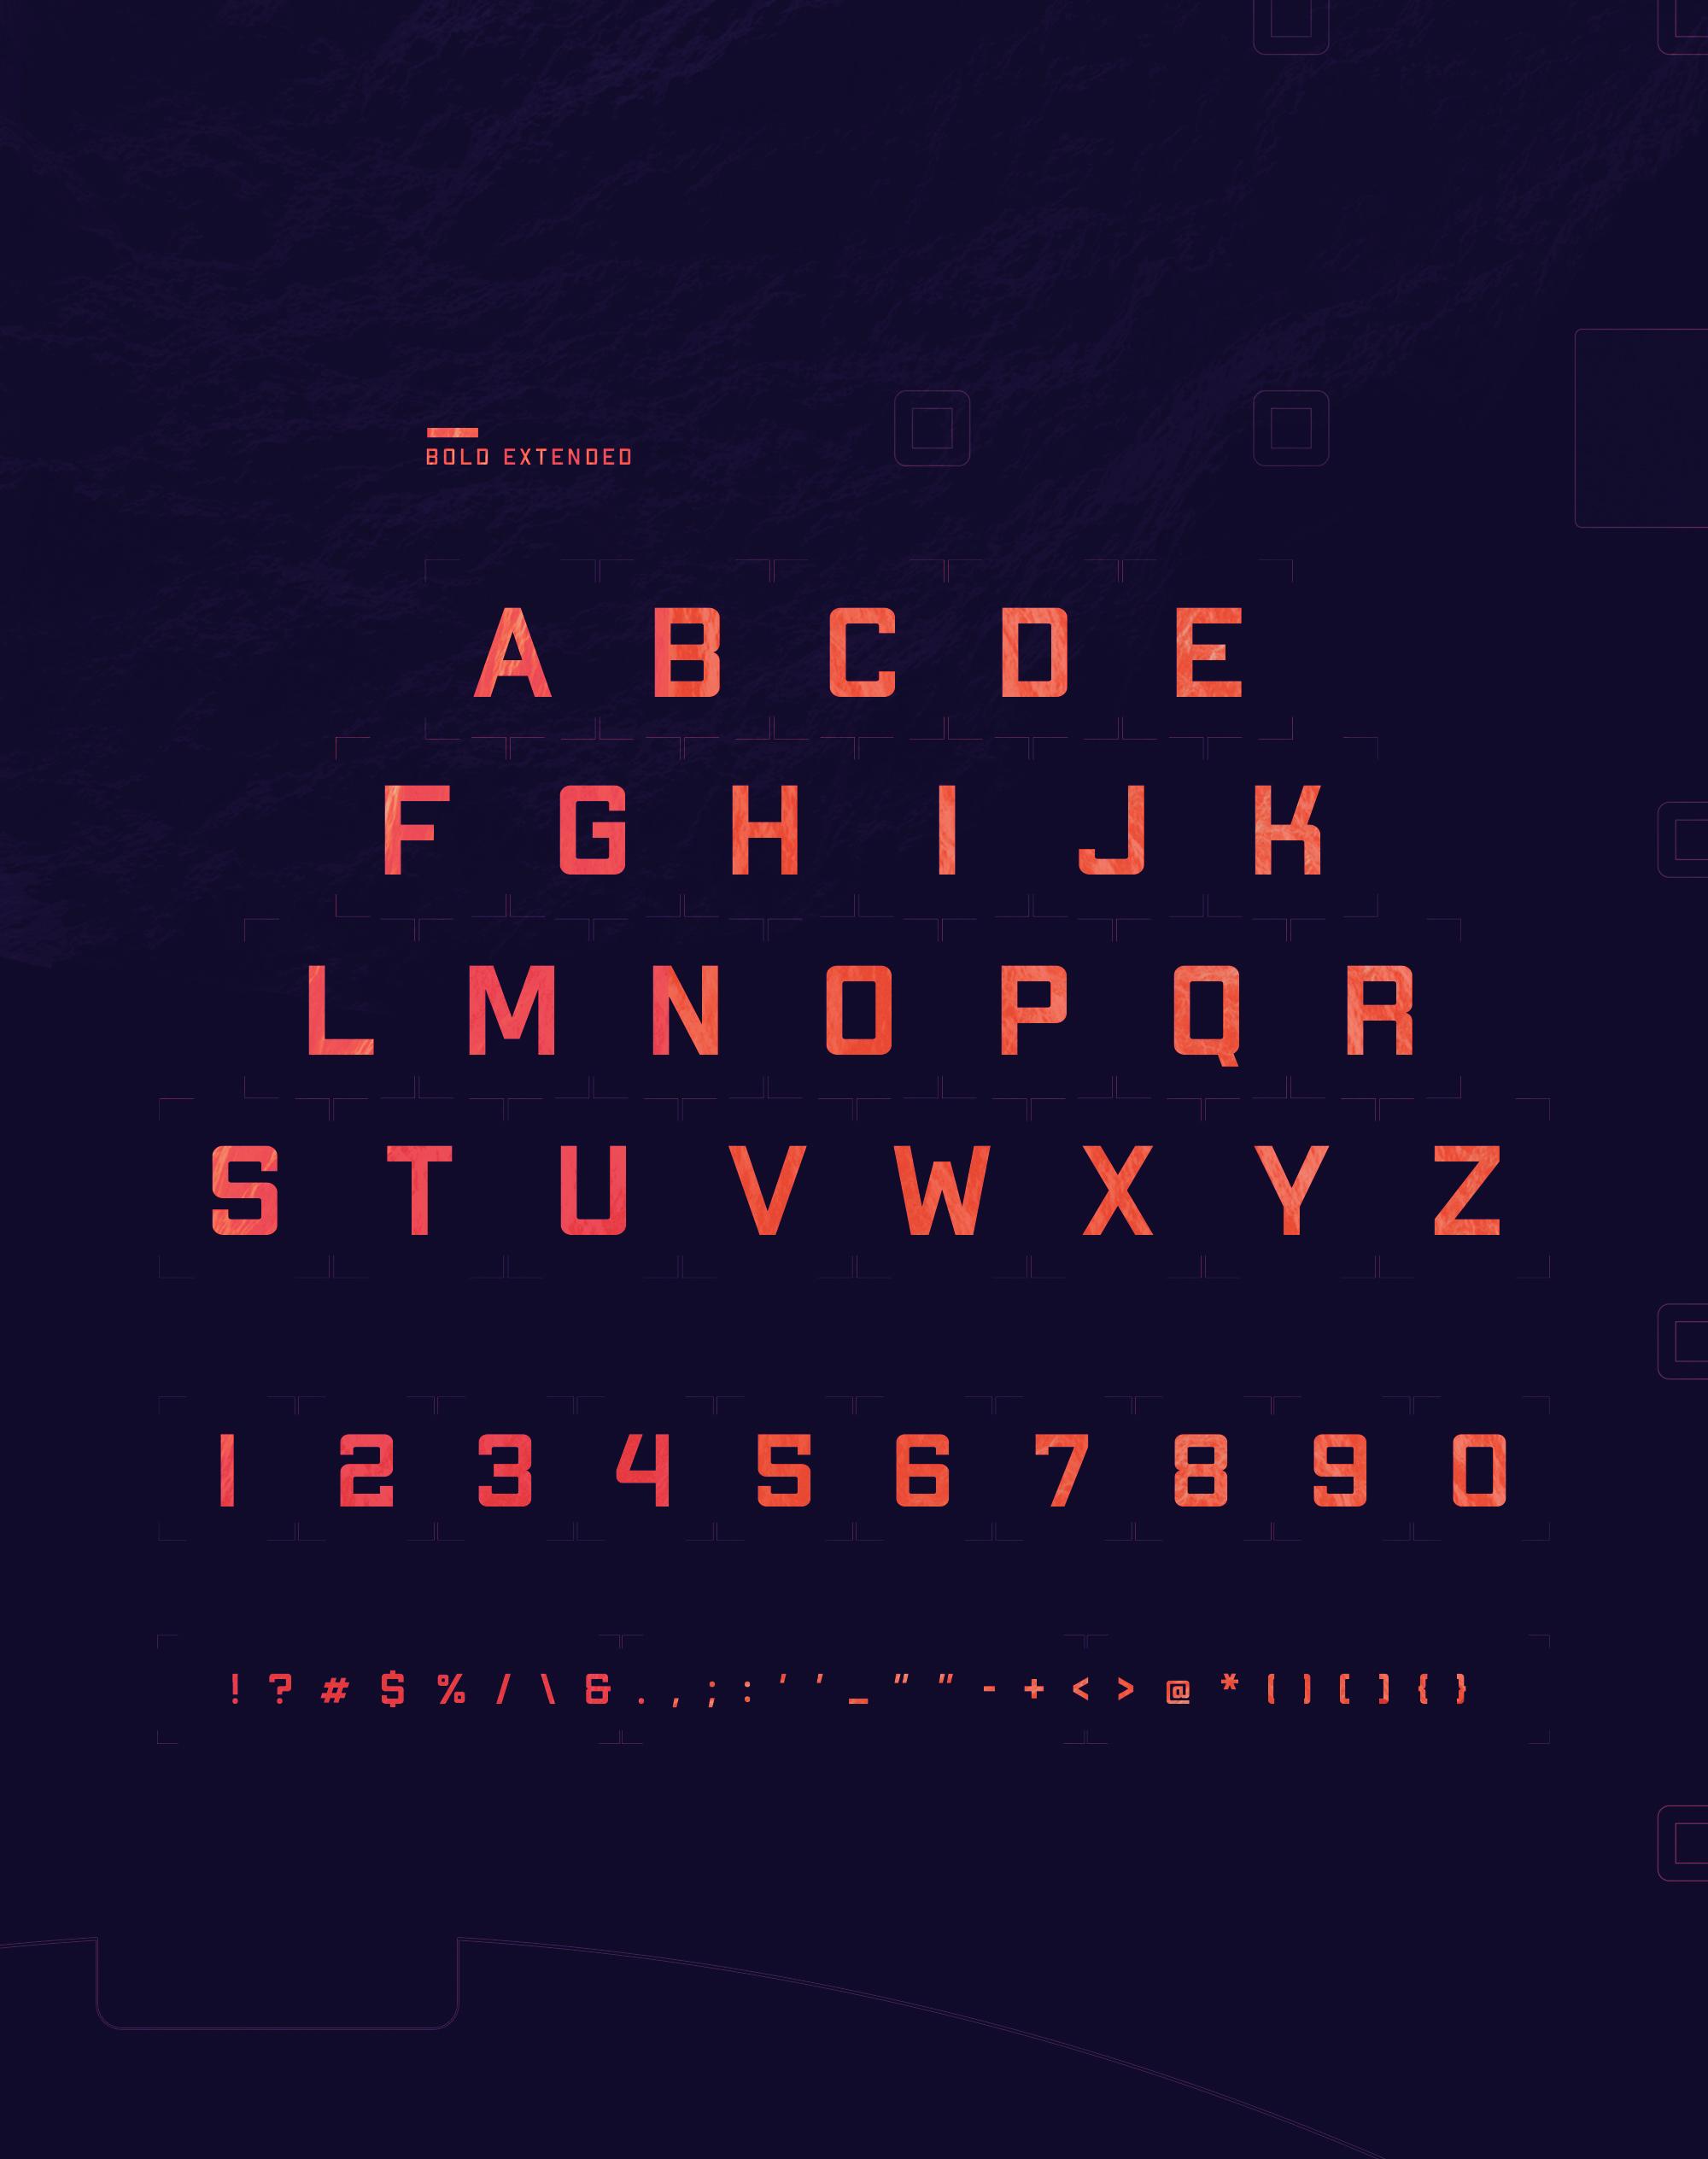 Apex MK2 Font Alphabets